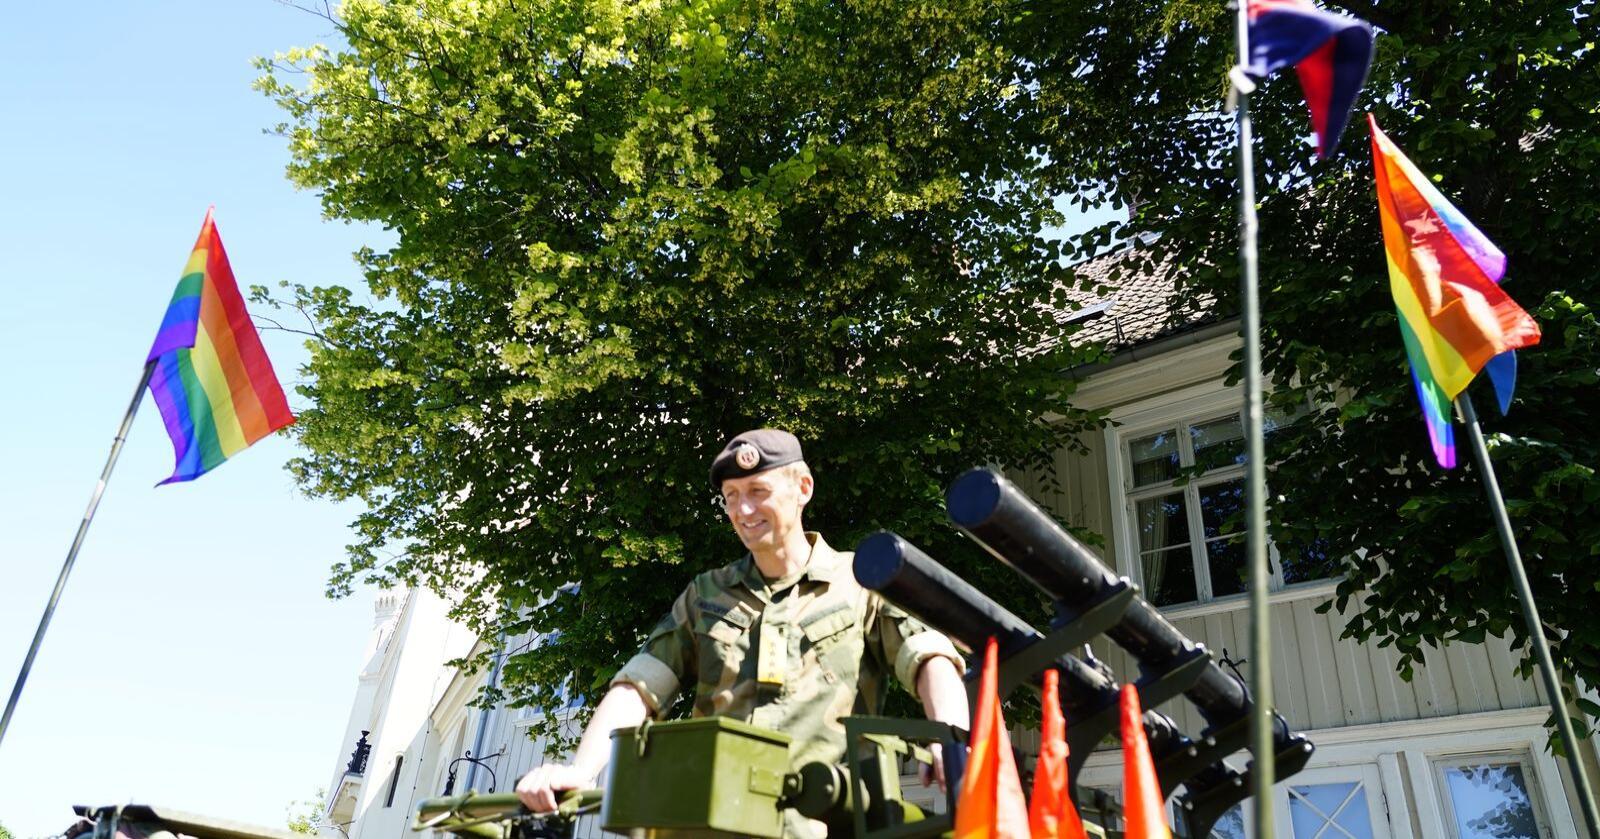 Forsvarssjef general Eirik Kristoffersen deltar i Pride  Parade i oslo sentrum lørdag. Foto: Terje Pedersen / NTB